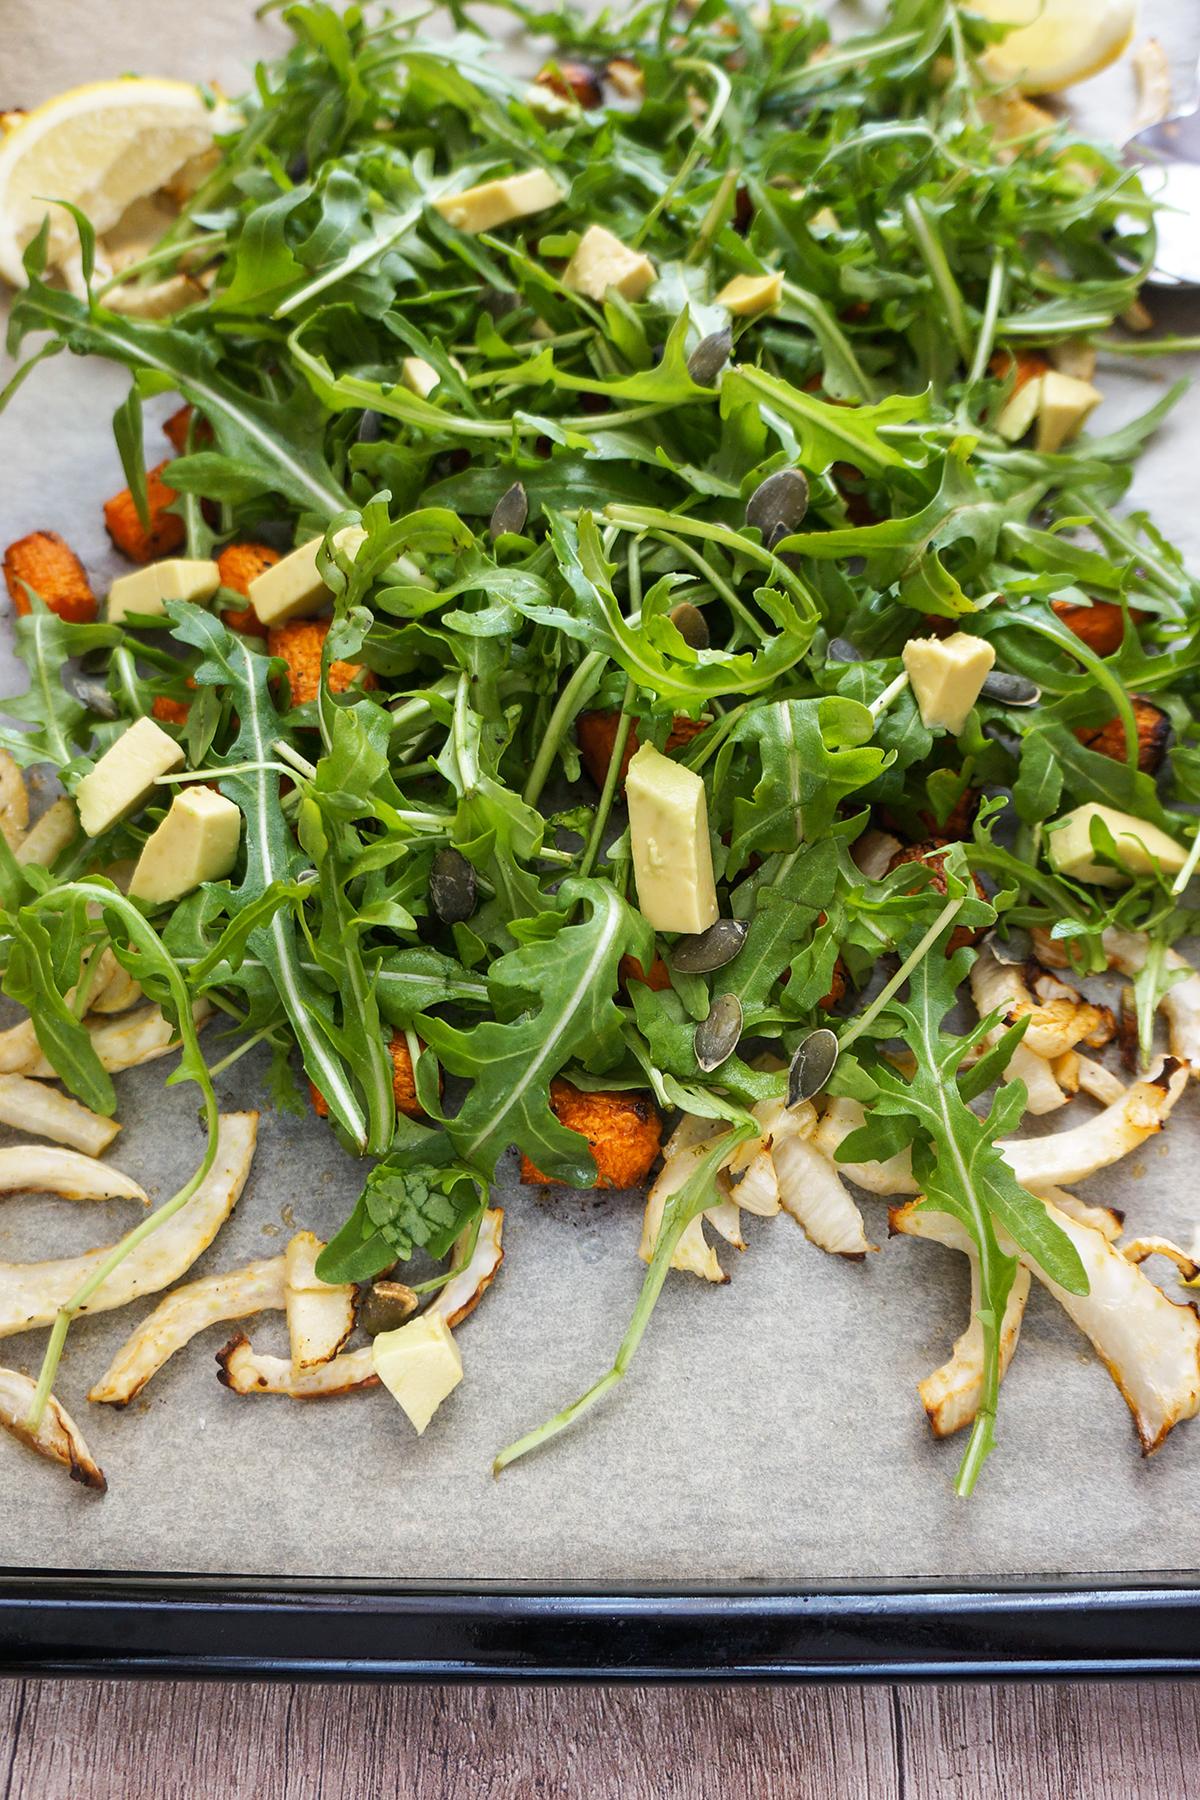 Rukola s pečenim korenjem, koromačem in avokadom